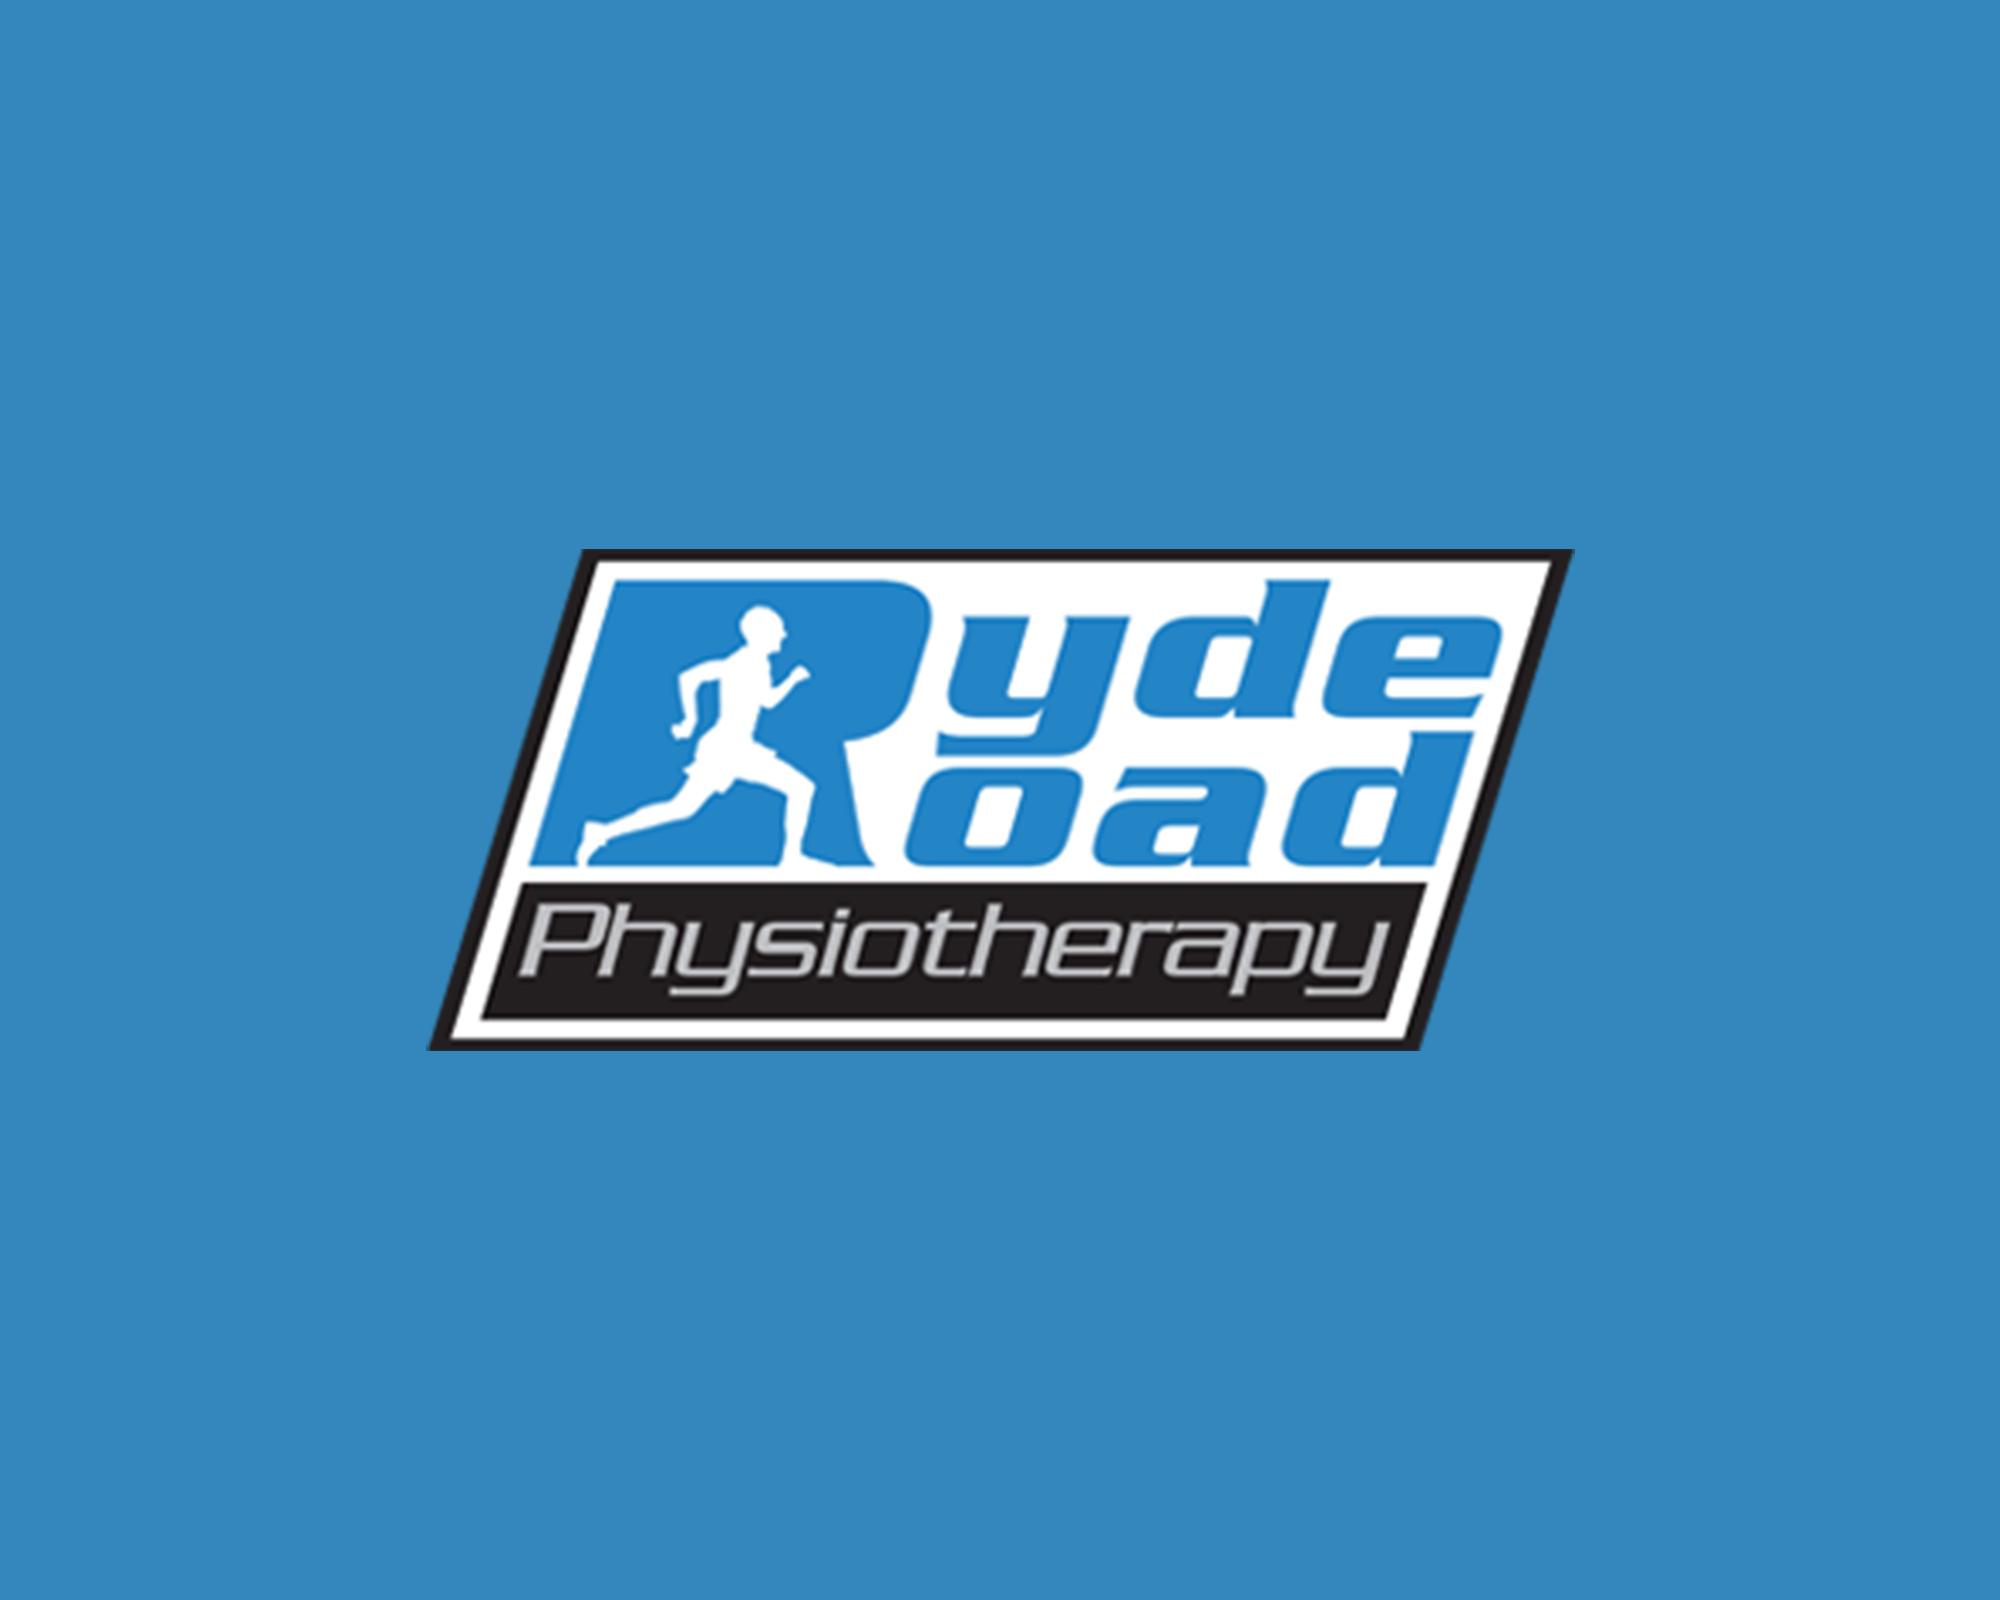 ryde road physio Logo